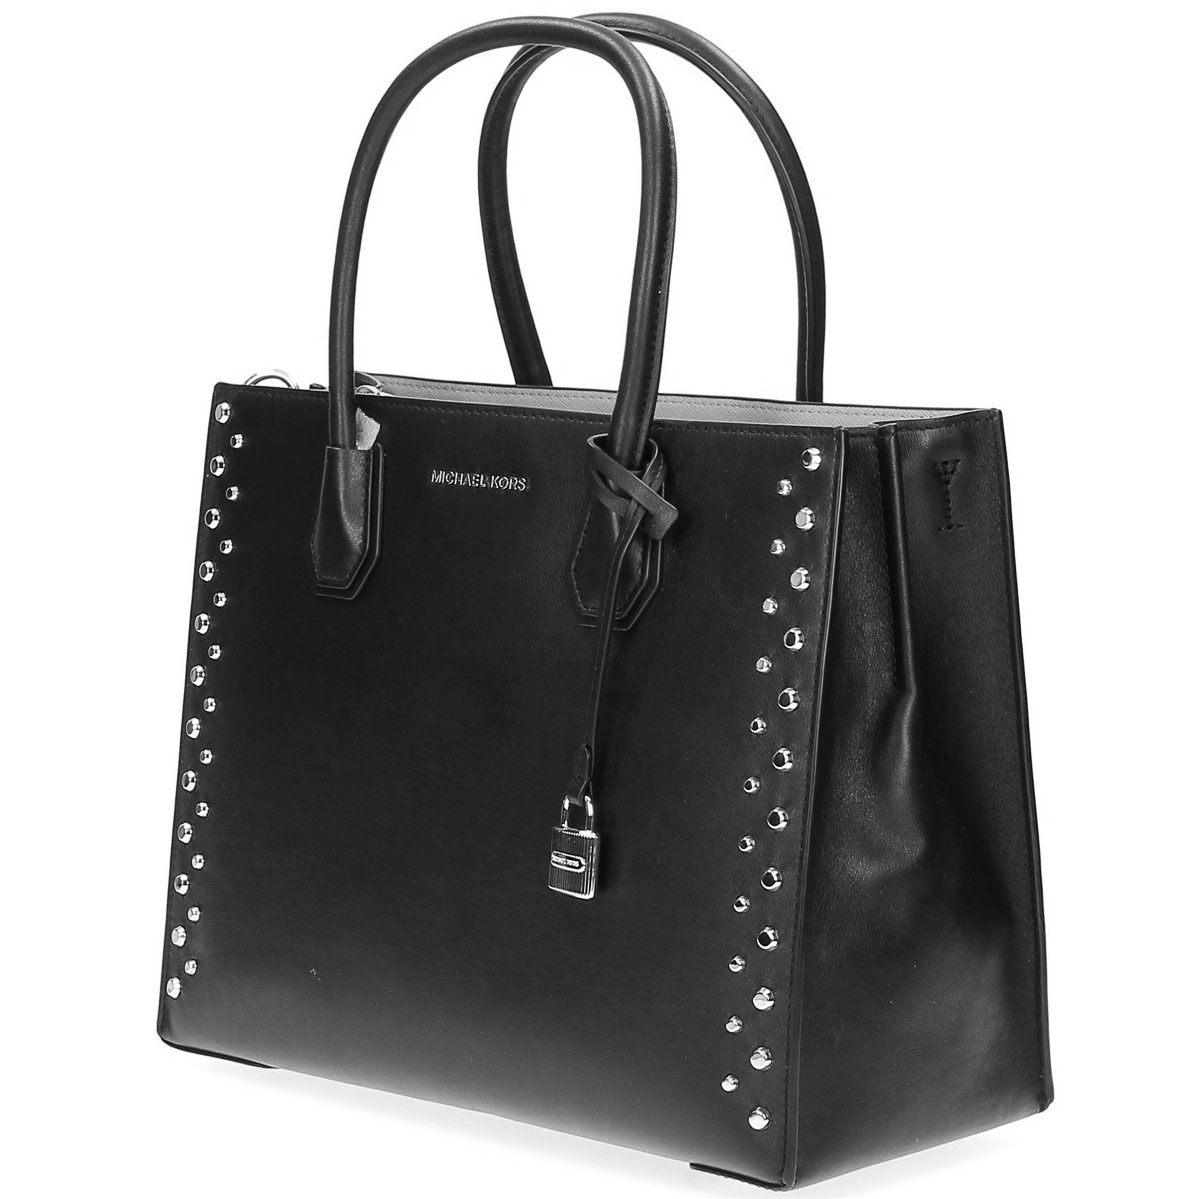 05fdab81a00e Michael Kors Mercer Stud & Grommet Large Convertible Leather Tote Black #  30S7SZ4T3L